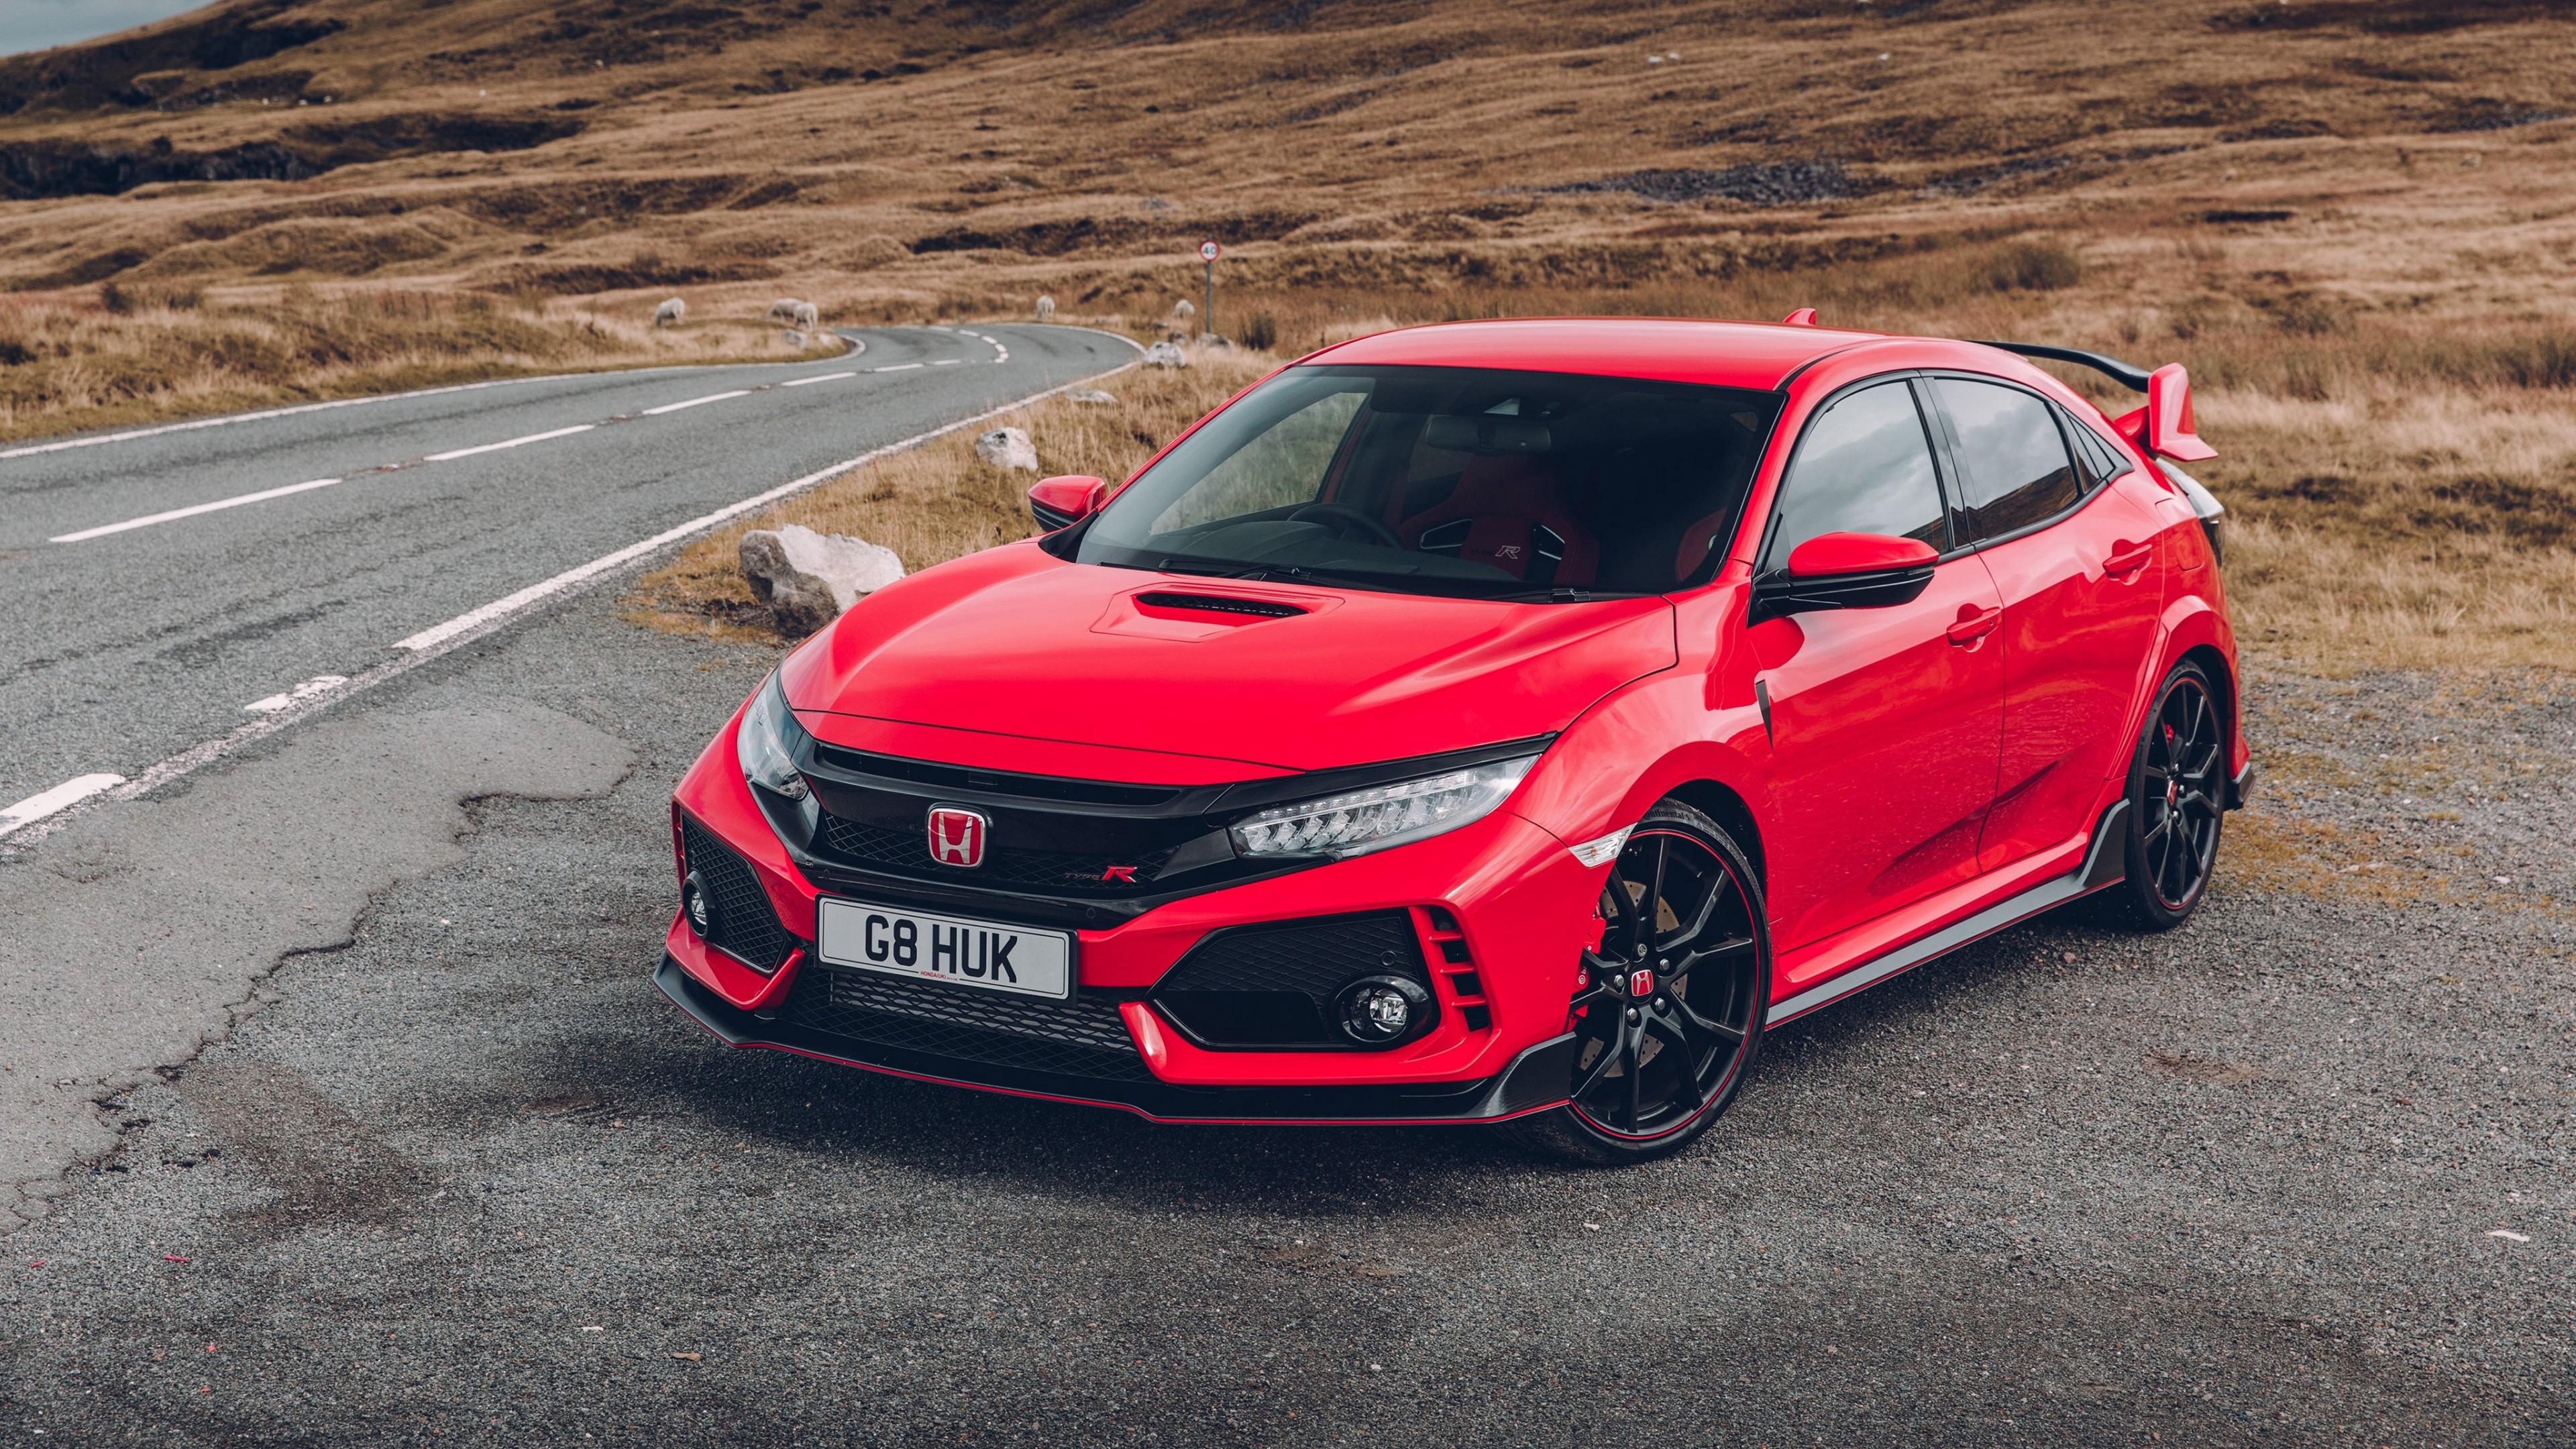 Honda Civic Hatchback 2019 4K Wallpaper | HD Car